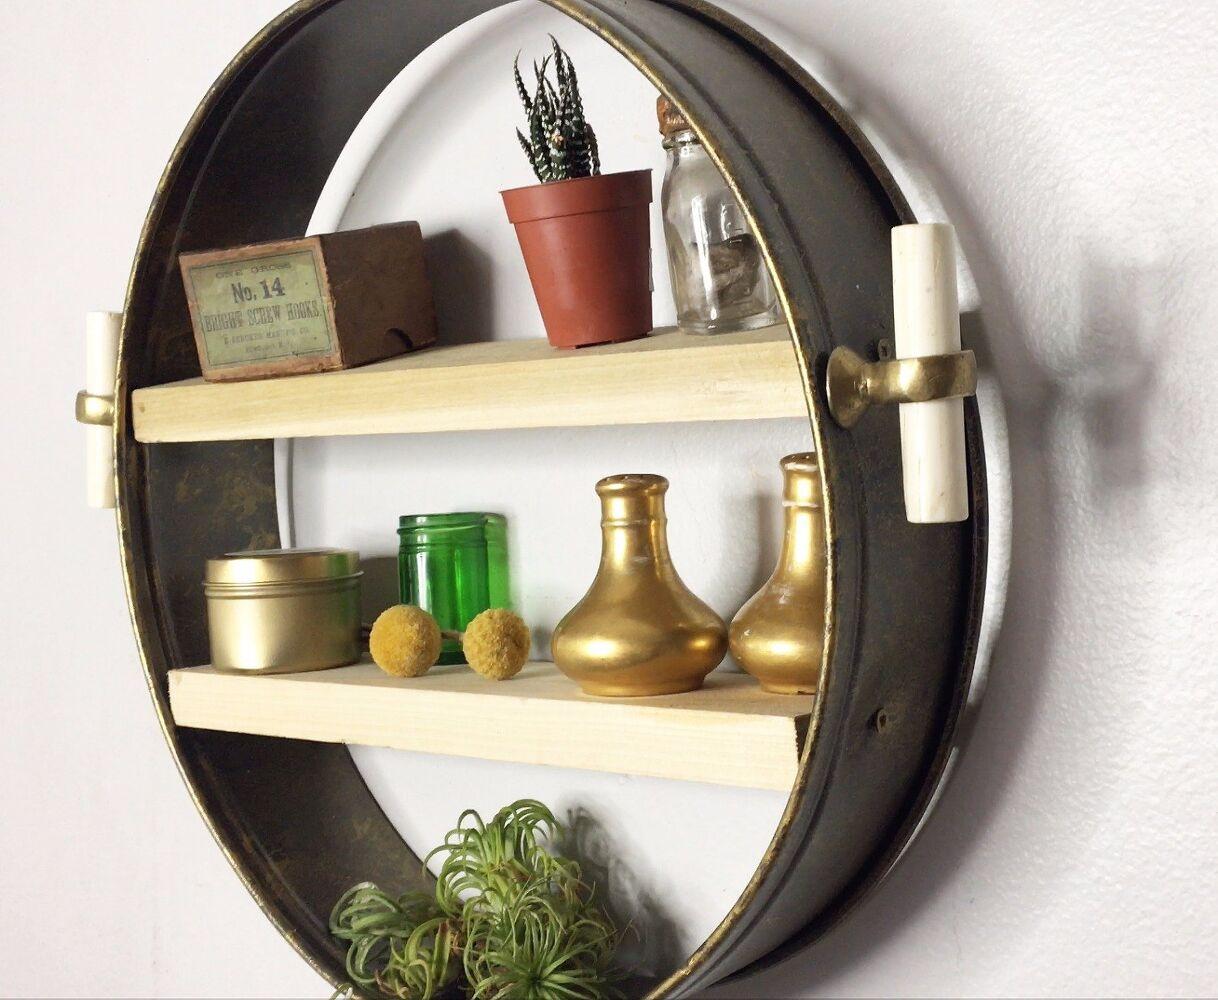 100 2017 home trends home design trends 2017 walker woodworking best 25 home trends ideas Home decor 2017 pinterest